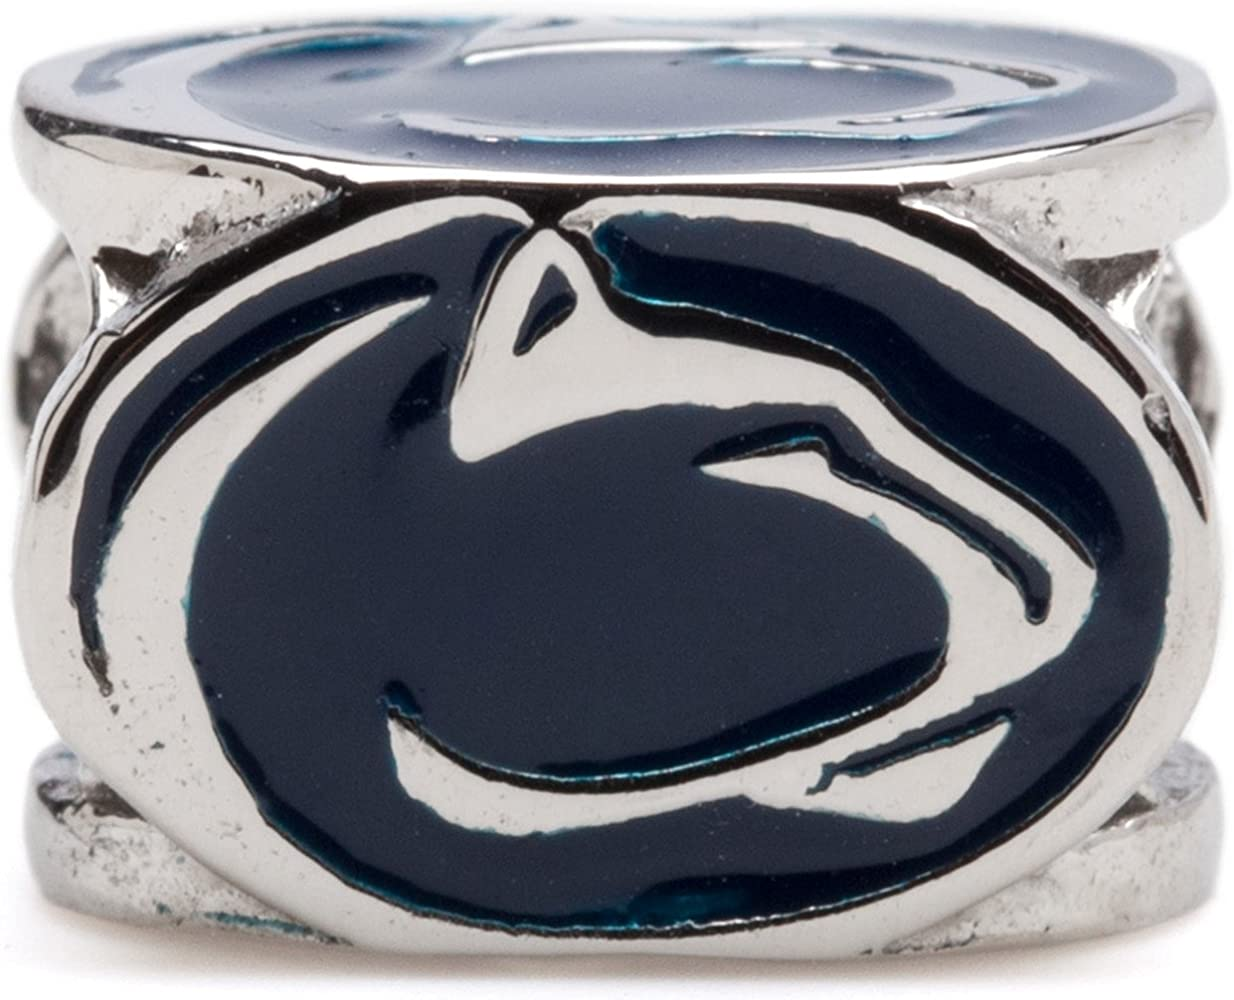 Solid 925 Sterling Silver Official Penn State University Medium Enamel Disc Pendant Charm 22mm x 15mm